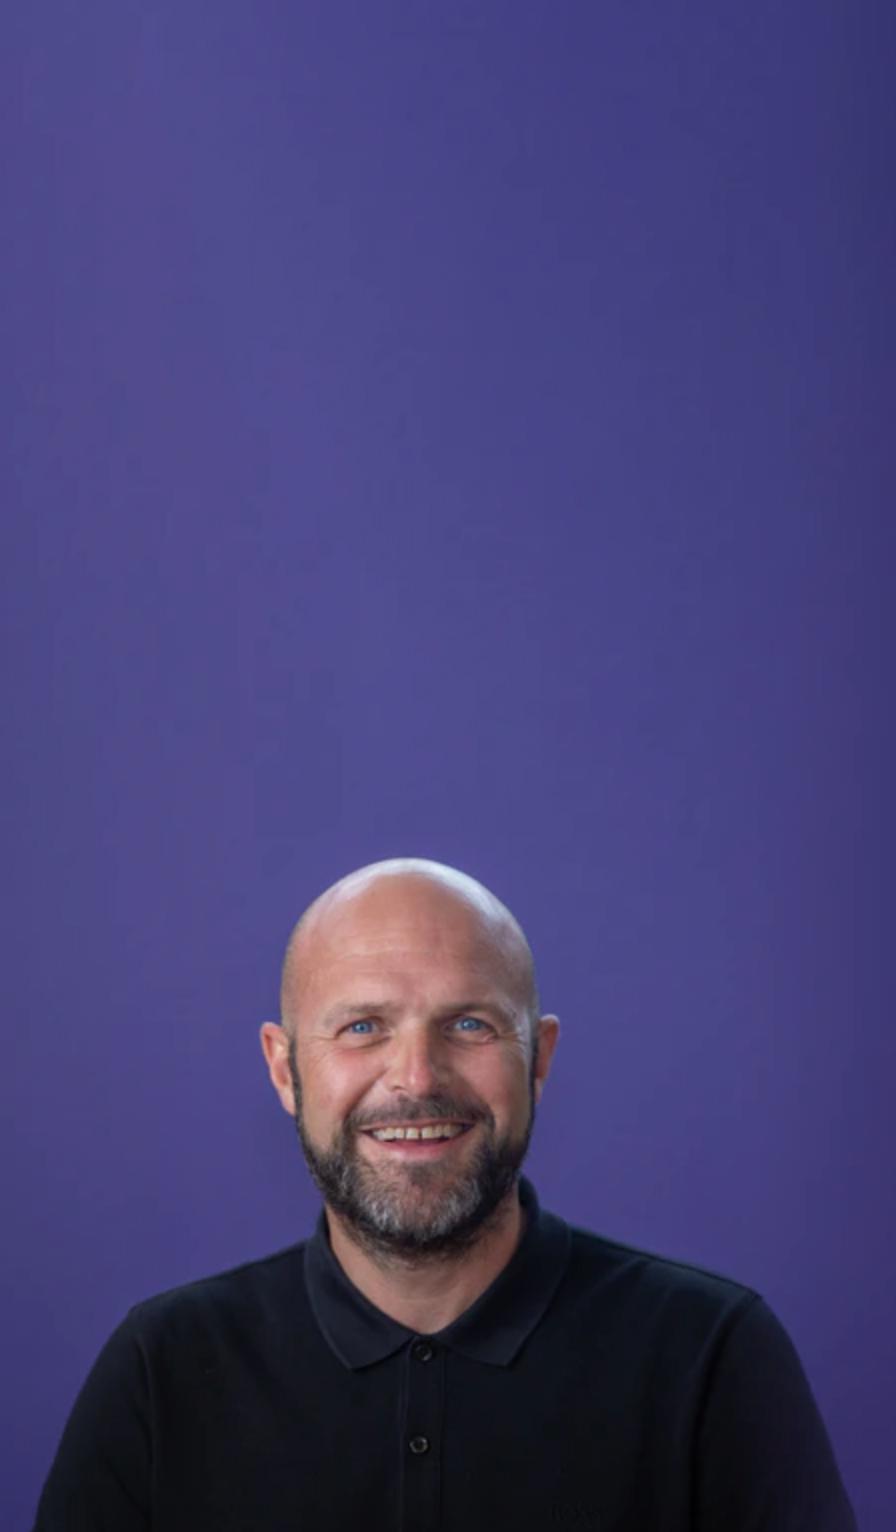 Michael Sherwood, Head of Digital Experience at Atom Bank